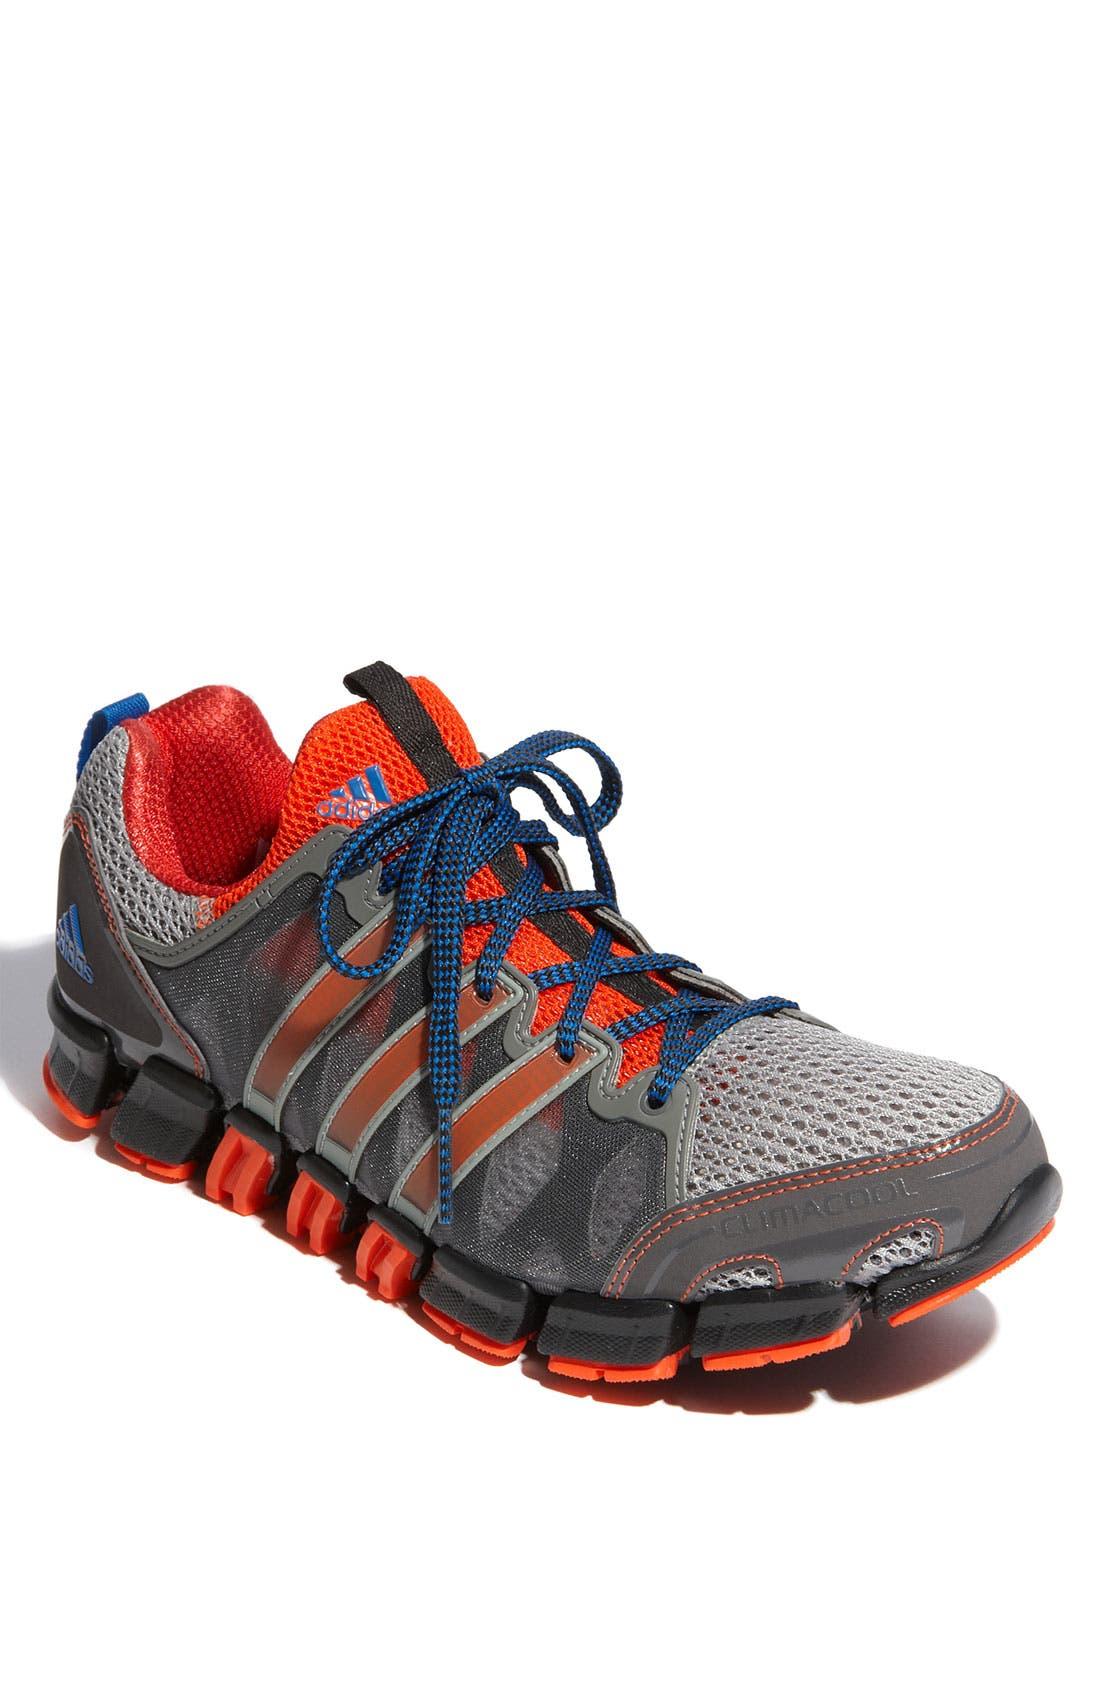 Alternate Image 1 Selected - adidas 'CLIMA Ride' Trail Running Shoe (Men)